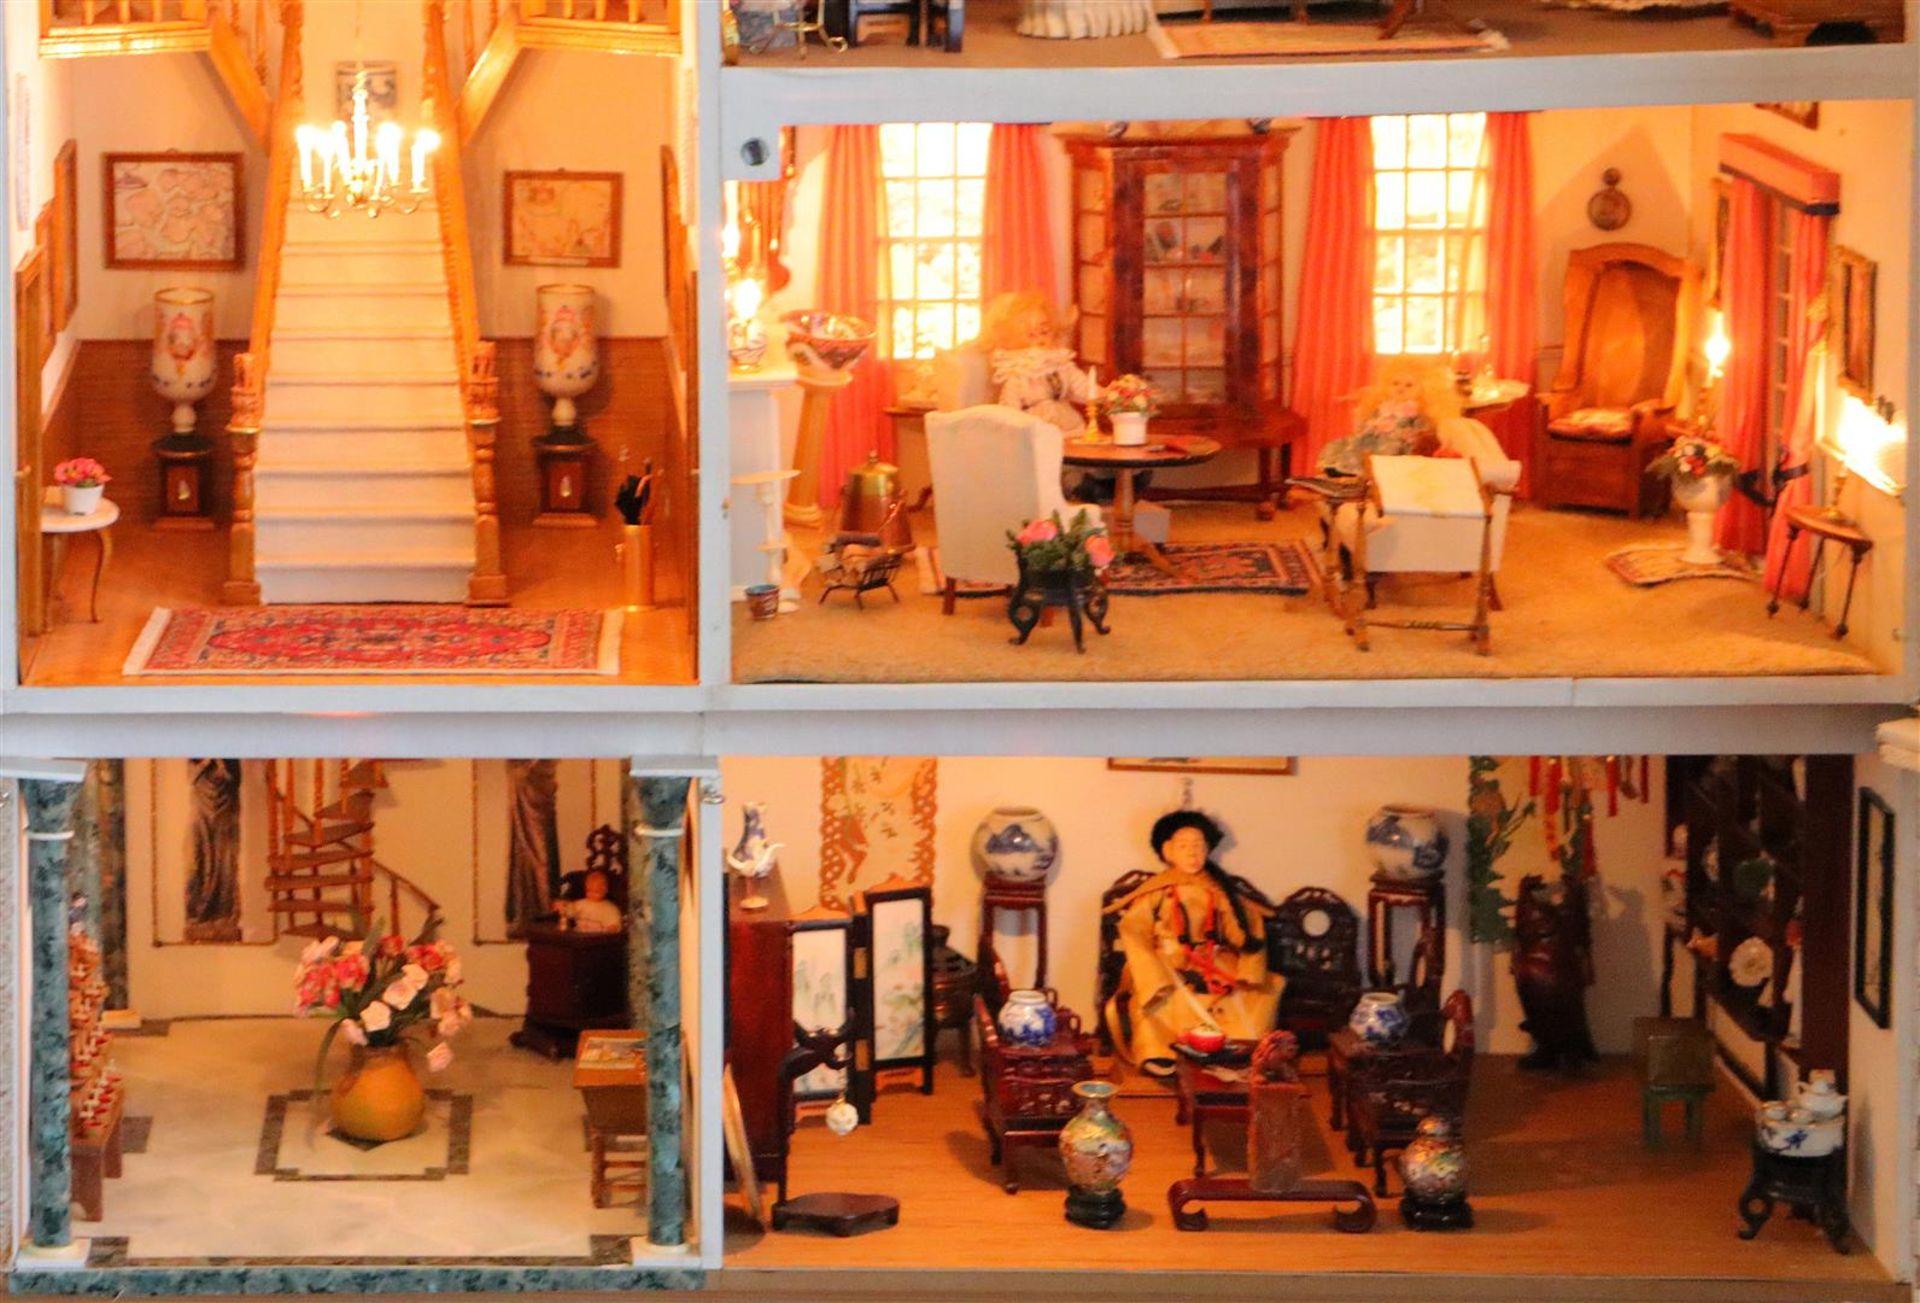 Dollhouse De Kettenborgh by Mrs. J C Wirix Kettenborg - Image 104 of 106